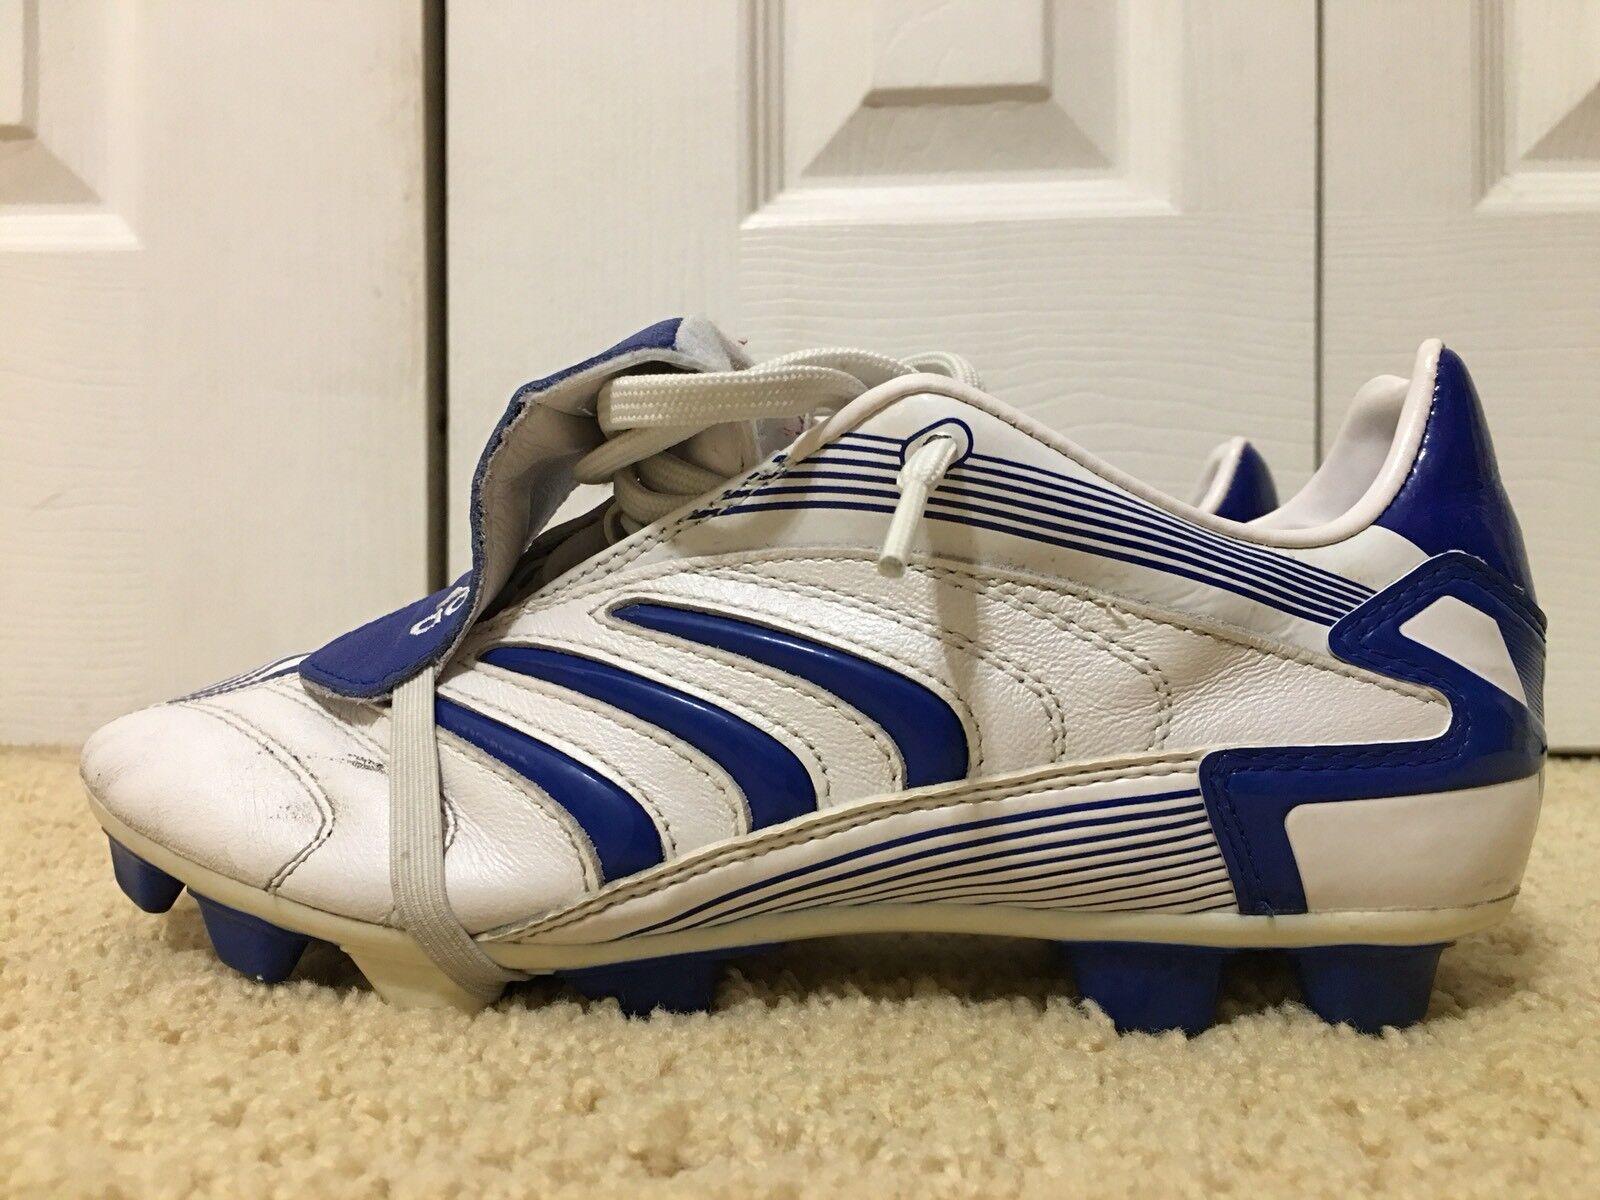 Adidas projoator Gama, arte Nº 017997, Boys fútbol tacos, blancoo Azul, Talla 5